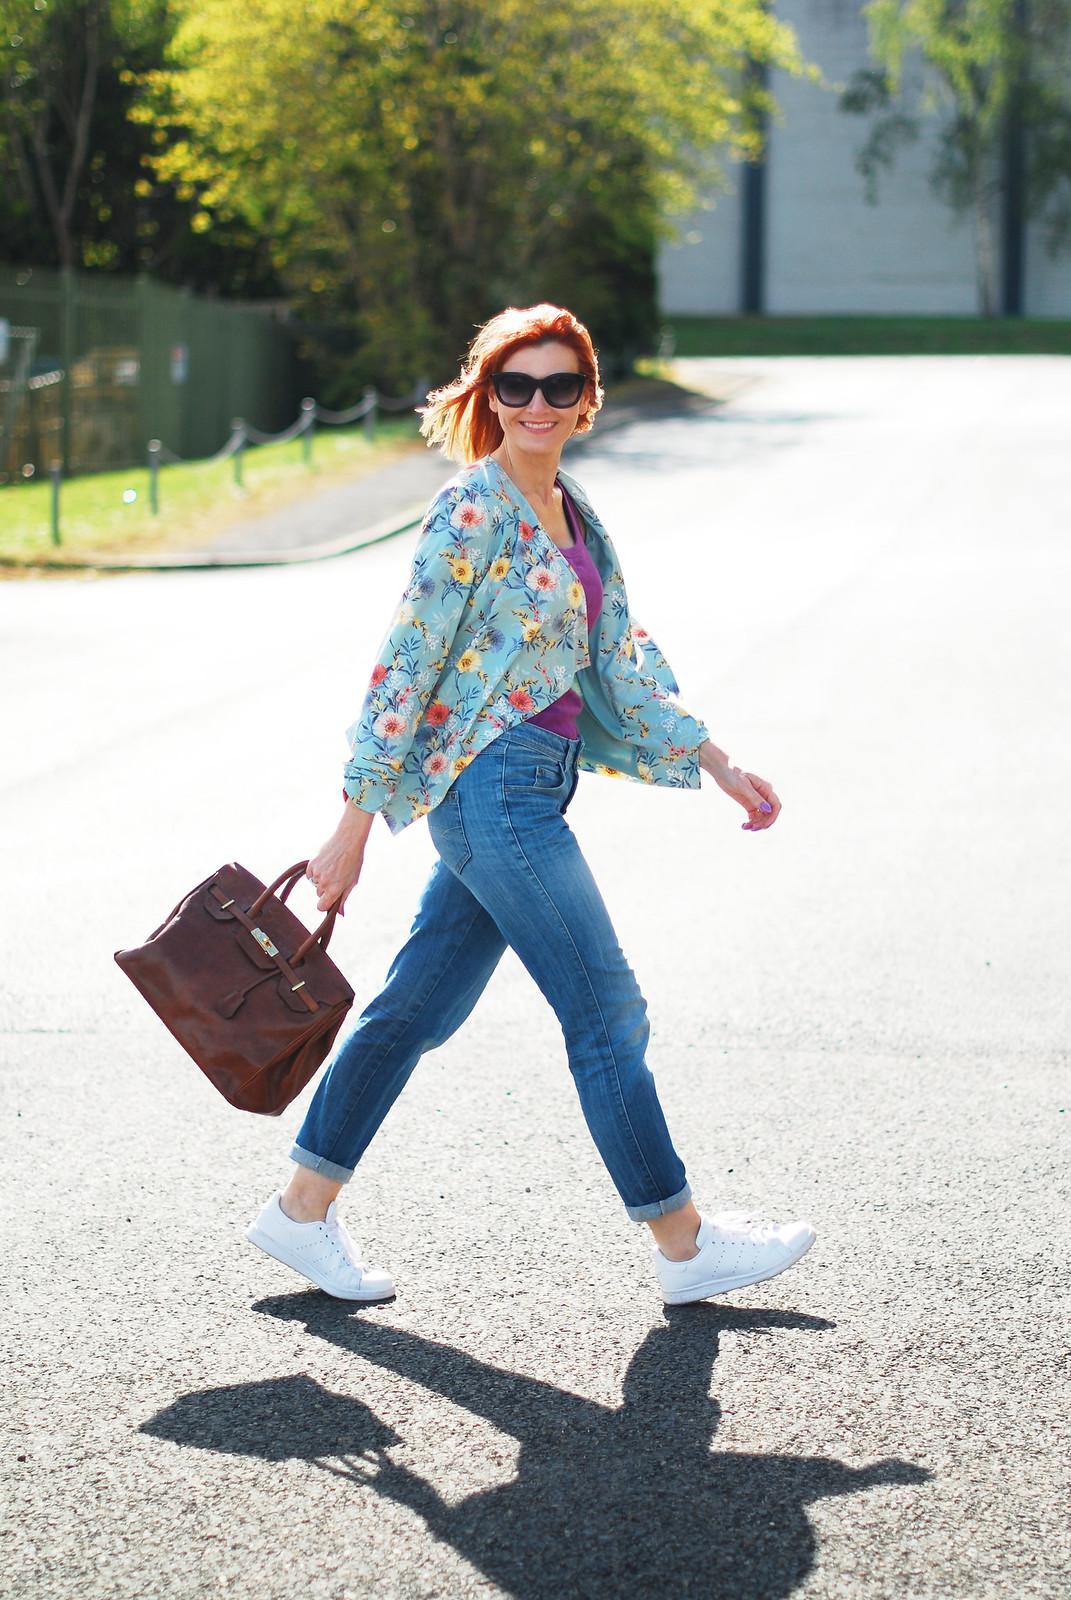 Casual Spring Summer look: Floral drape jacket, purple tank, boyfriend jeans, white Stan Smiths | Not Dressed As Lamb